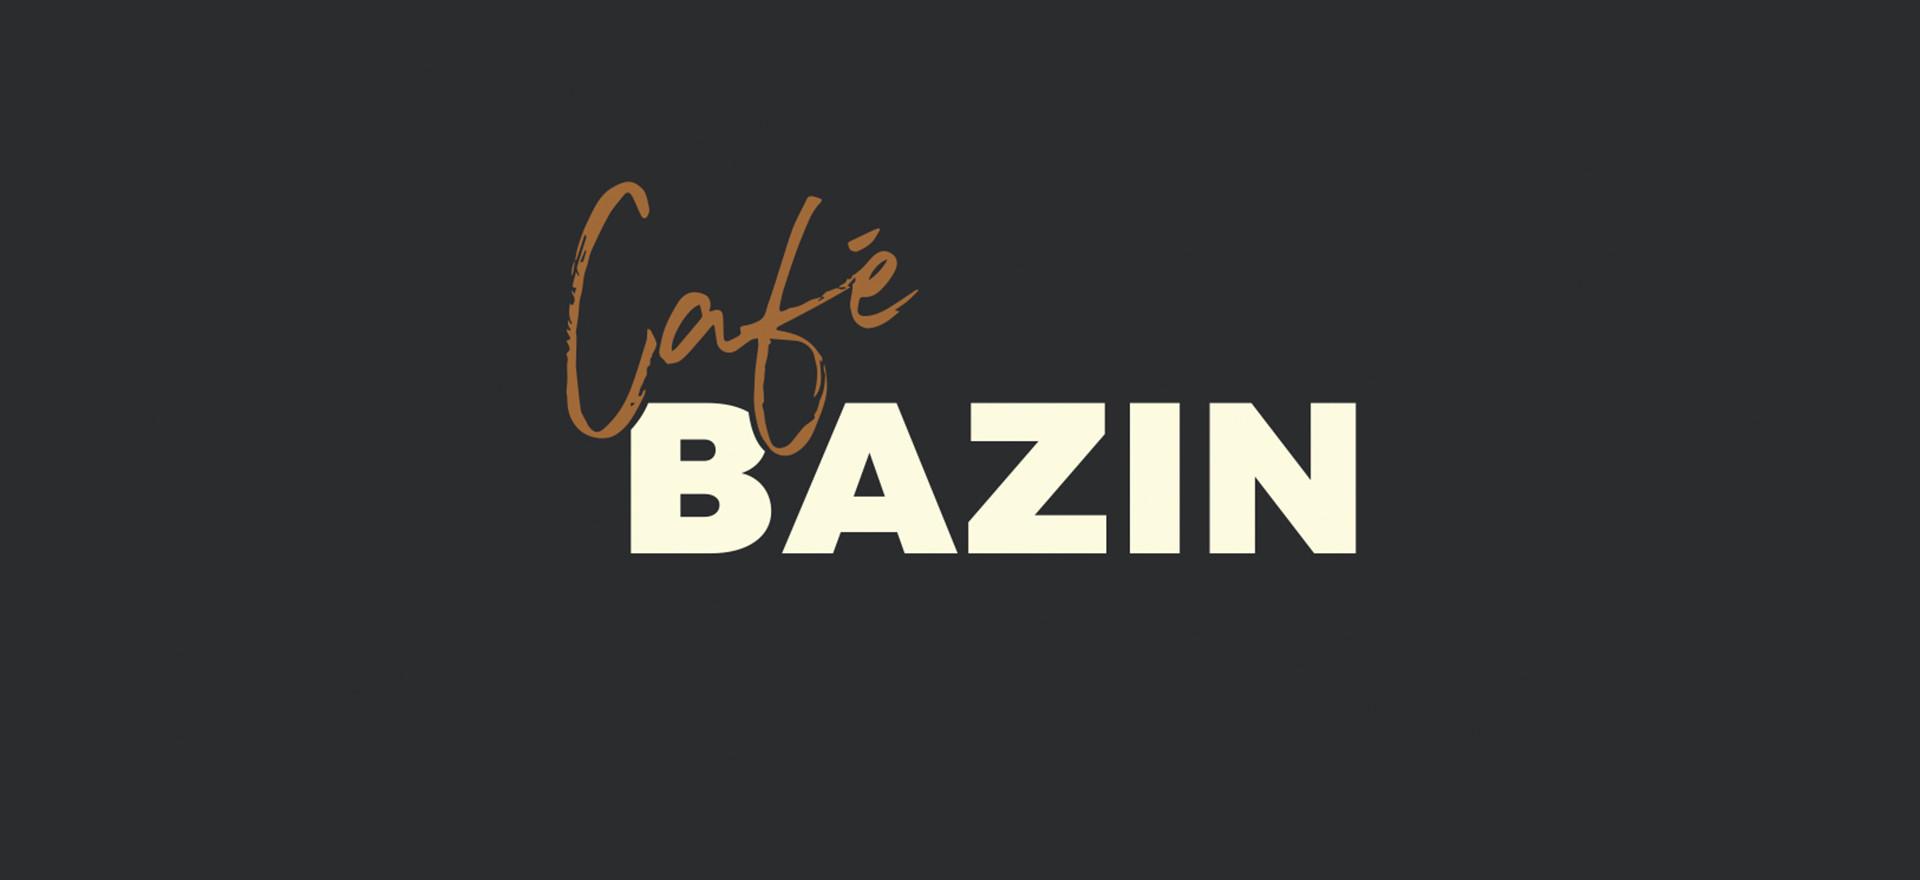 Café Bazin logo